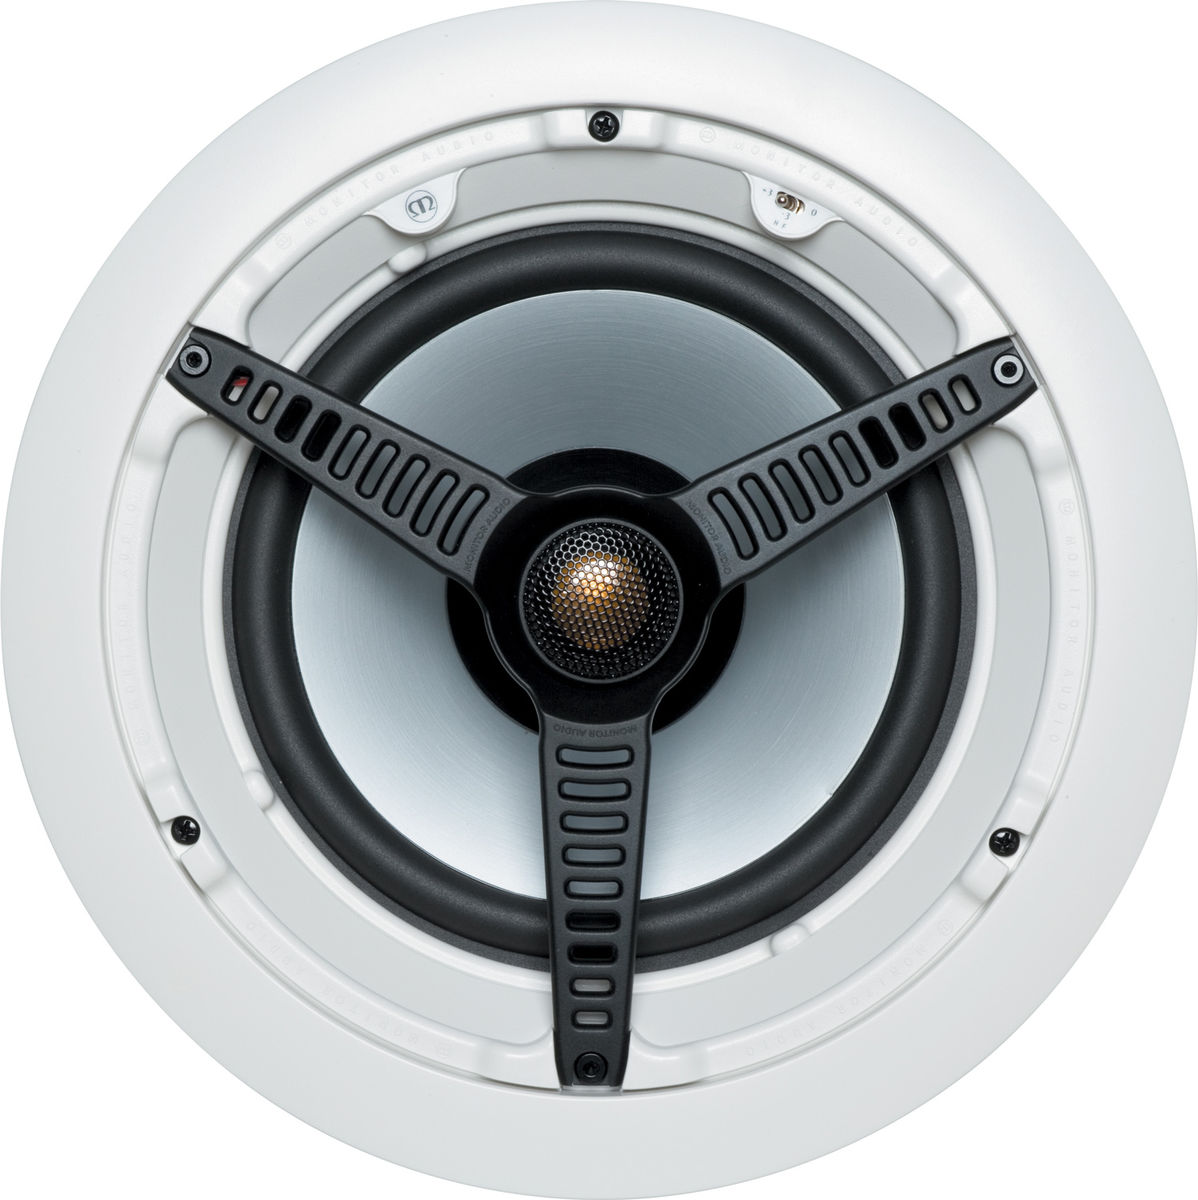 monitor audio ct180 enceintes encastrables son vid. Black Bedroom Furniture Sets. Home Design Ideas